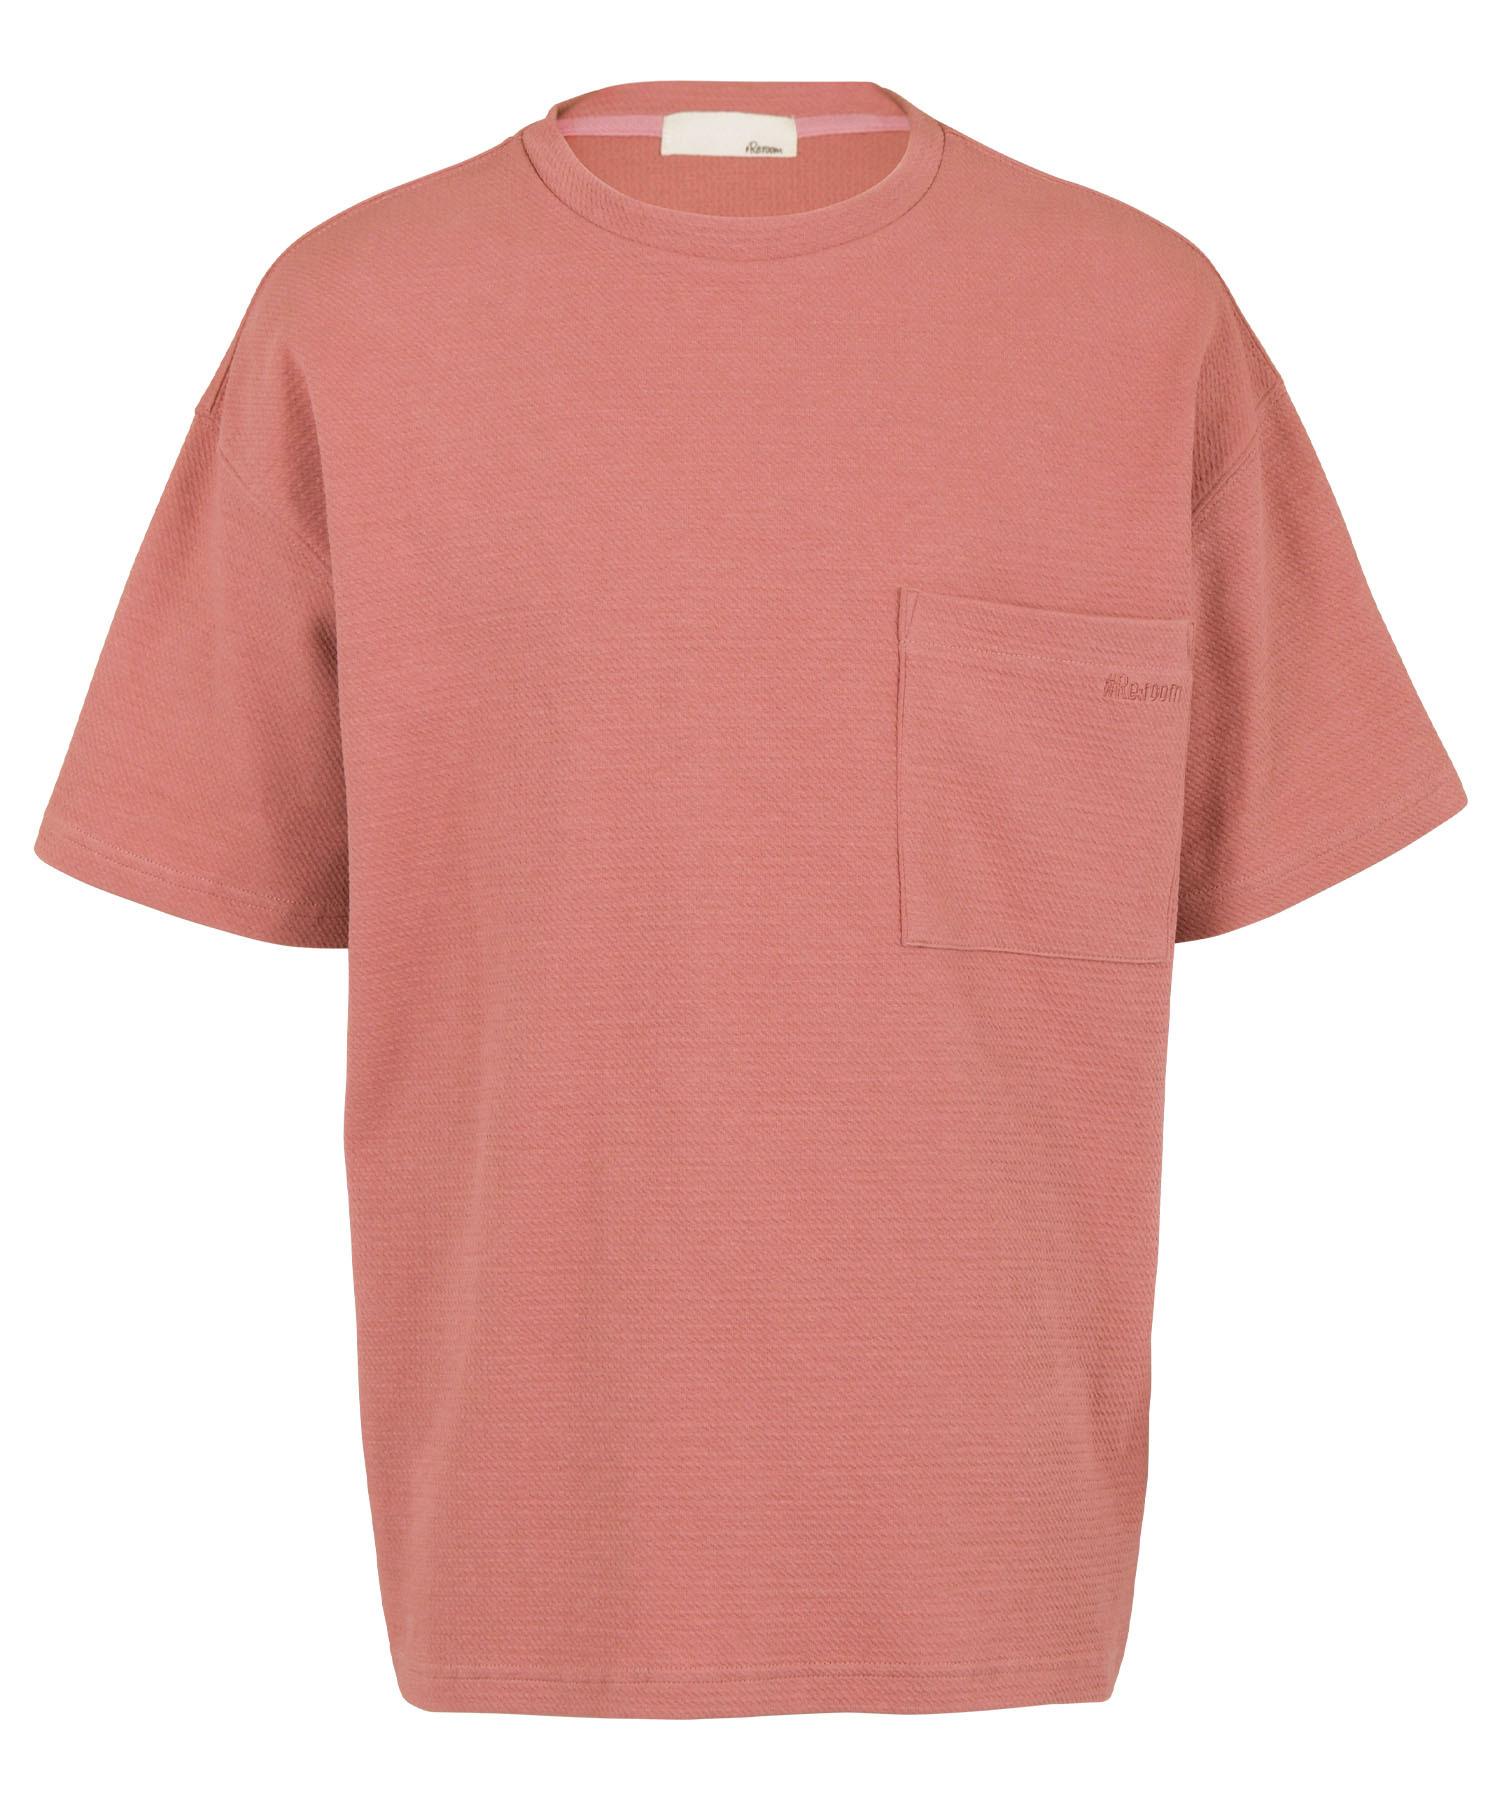 SMALL LOGO EMBROIDERY STRETCH COTTON BIG T-shirt[REC516]